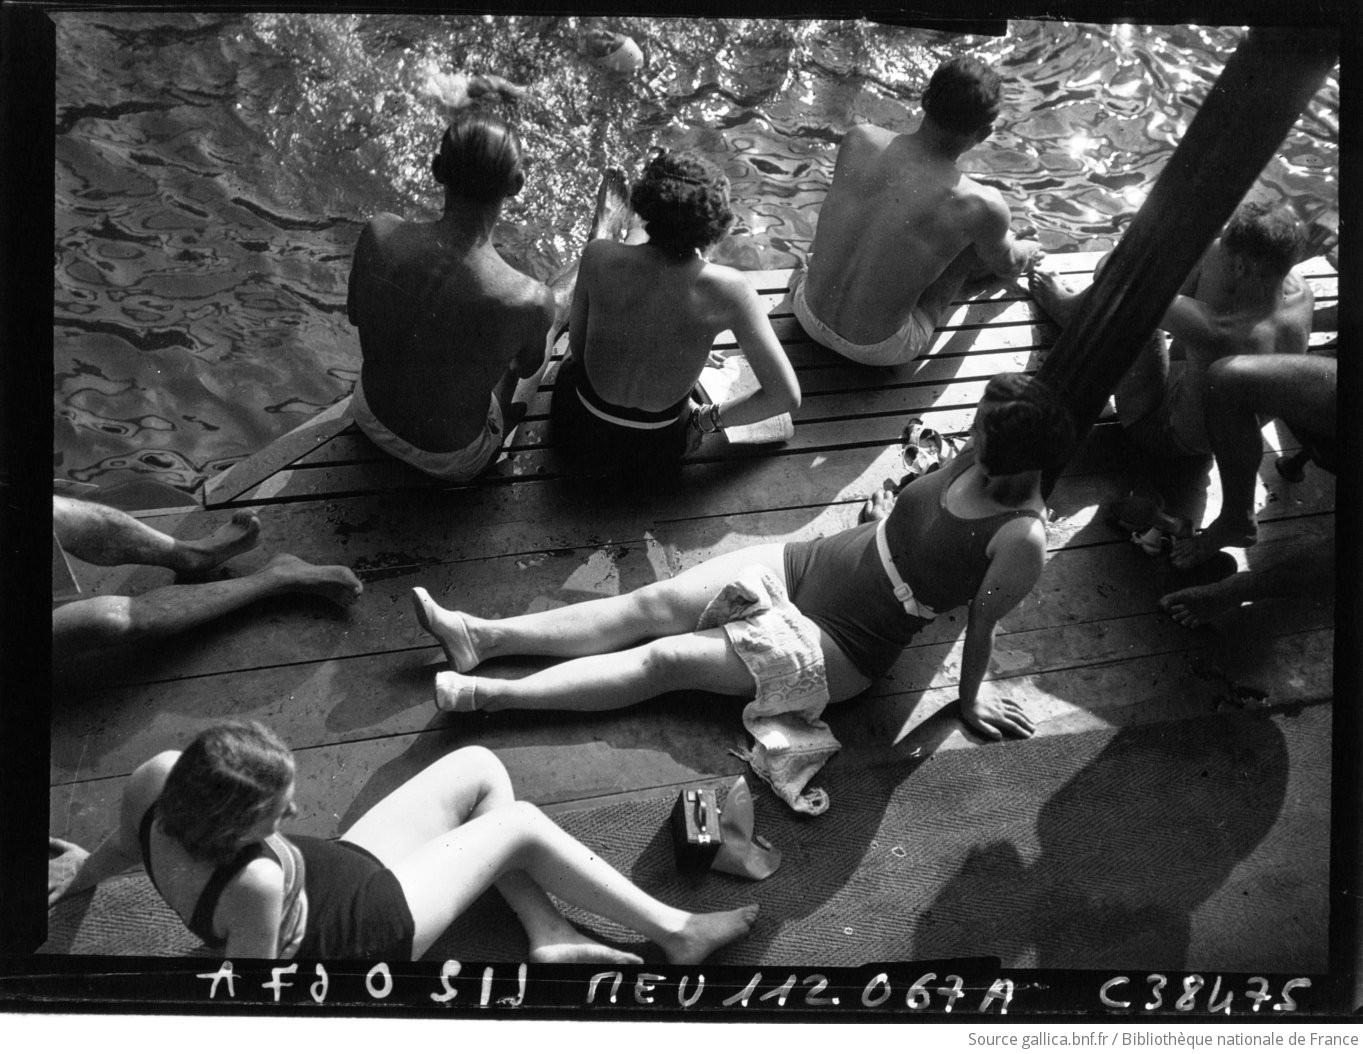 Piscine deligny bain de soleil photographie de presse for Piscine deligny